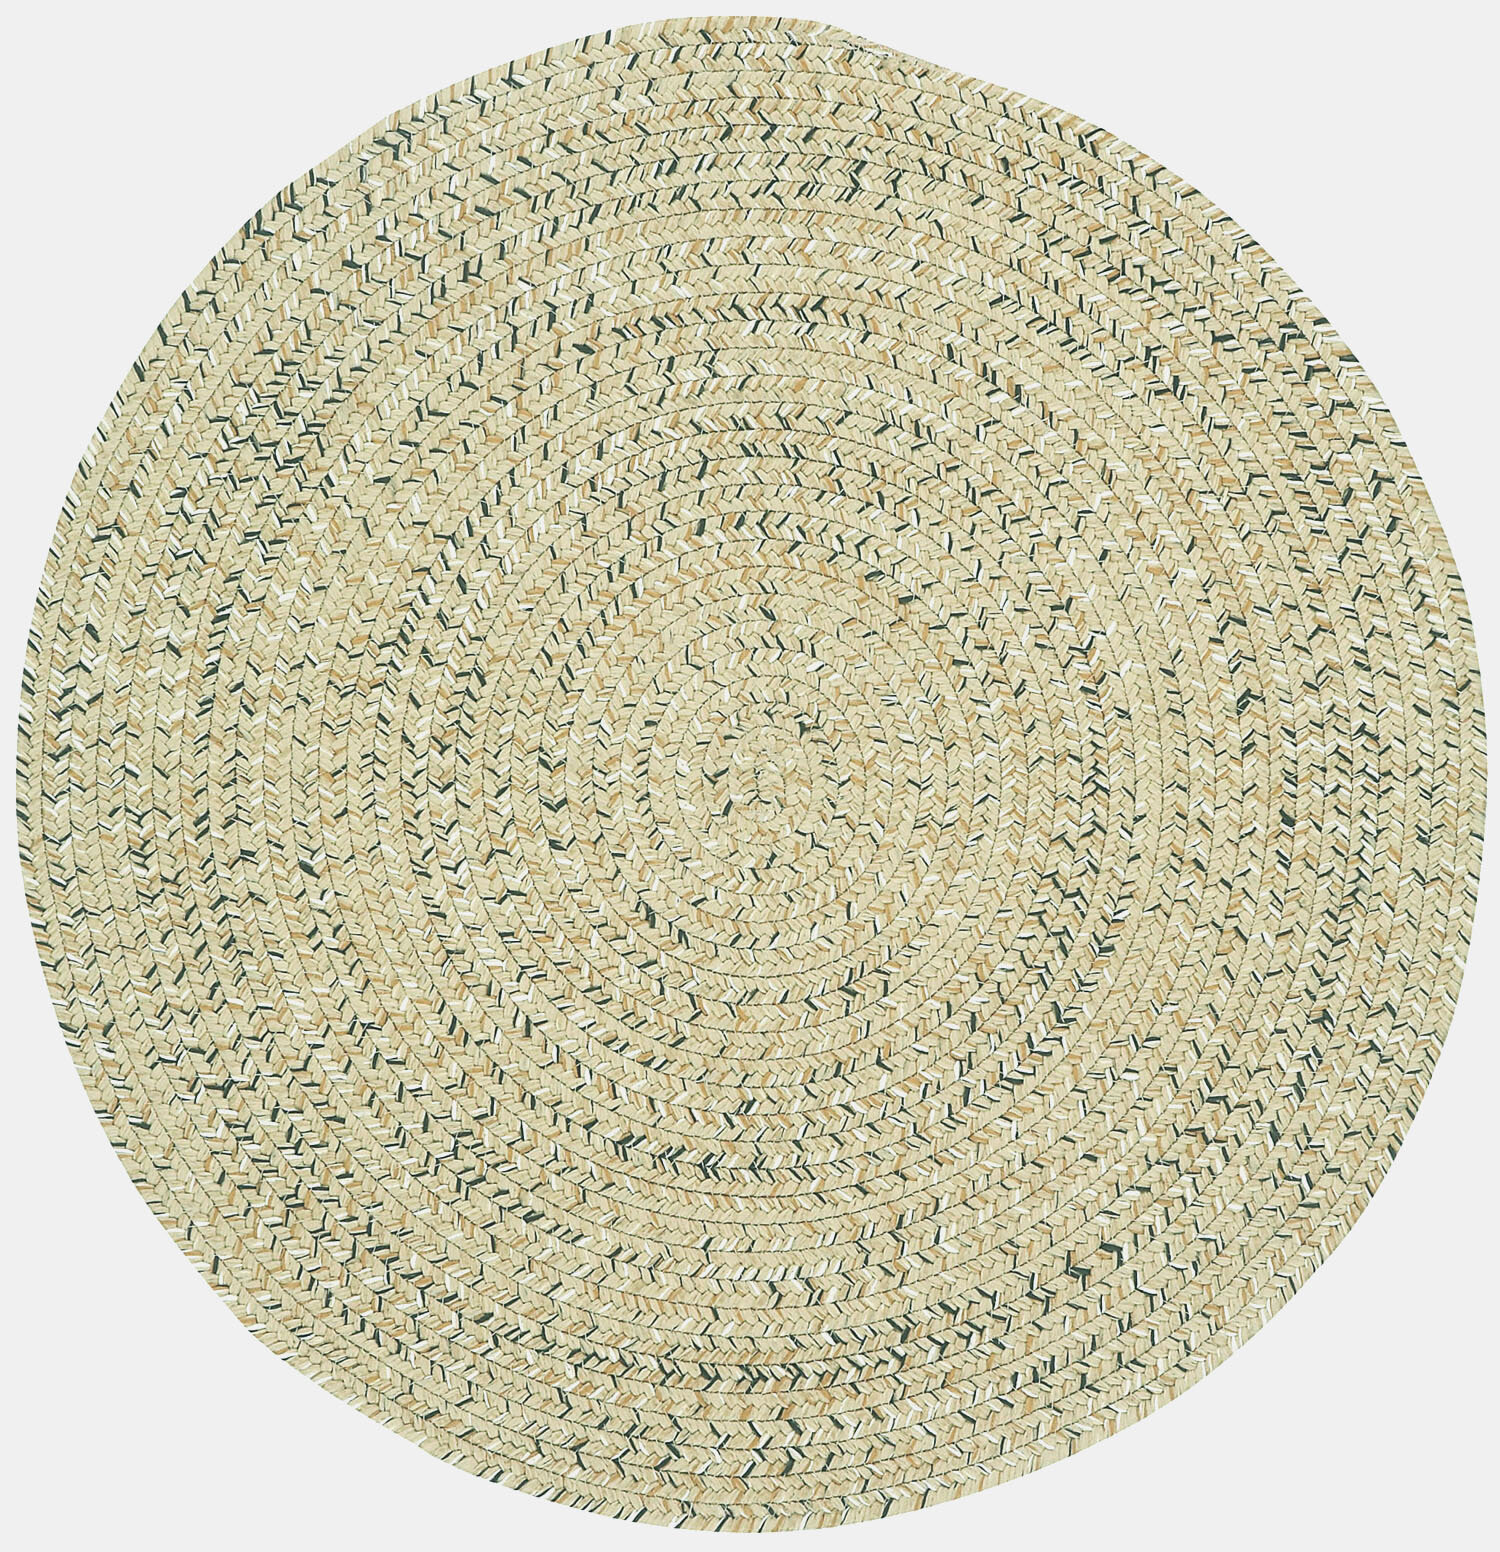 Isaiah Handmade Braided Beige Area Rug Reviews Joss Main